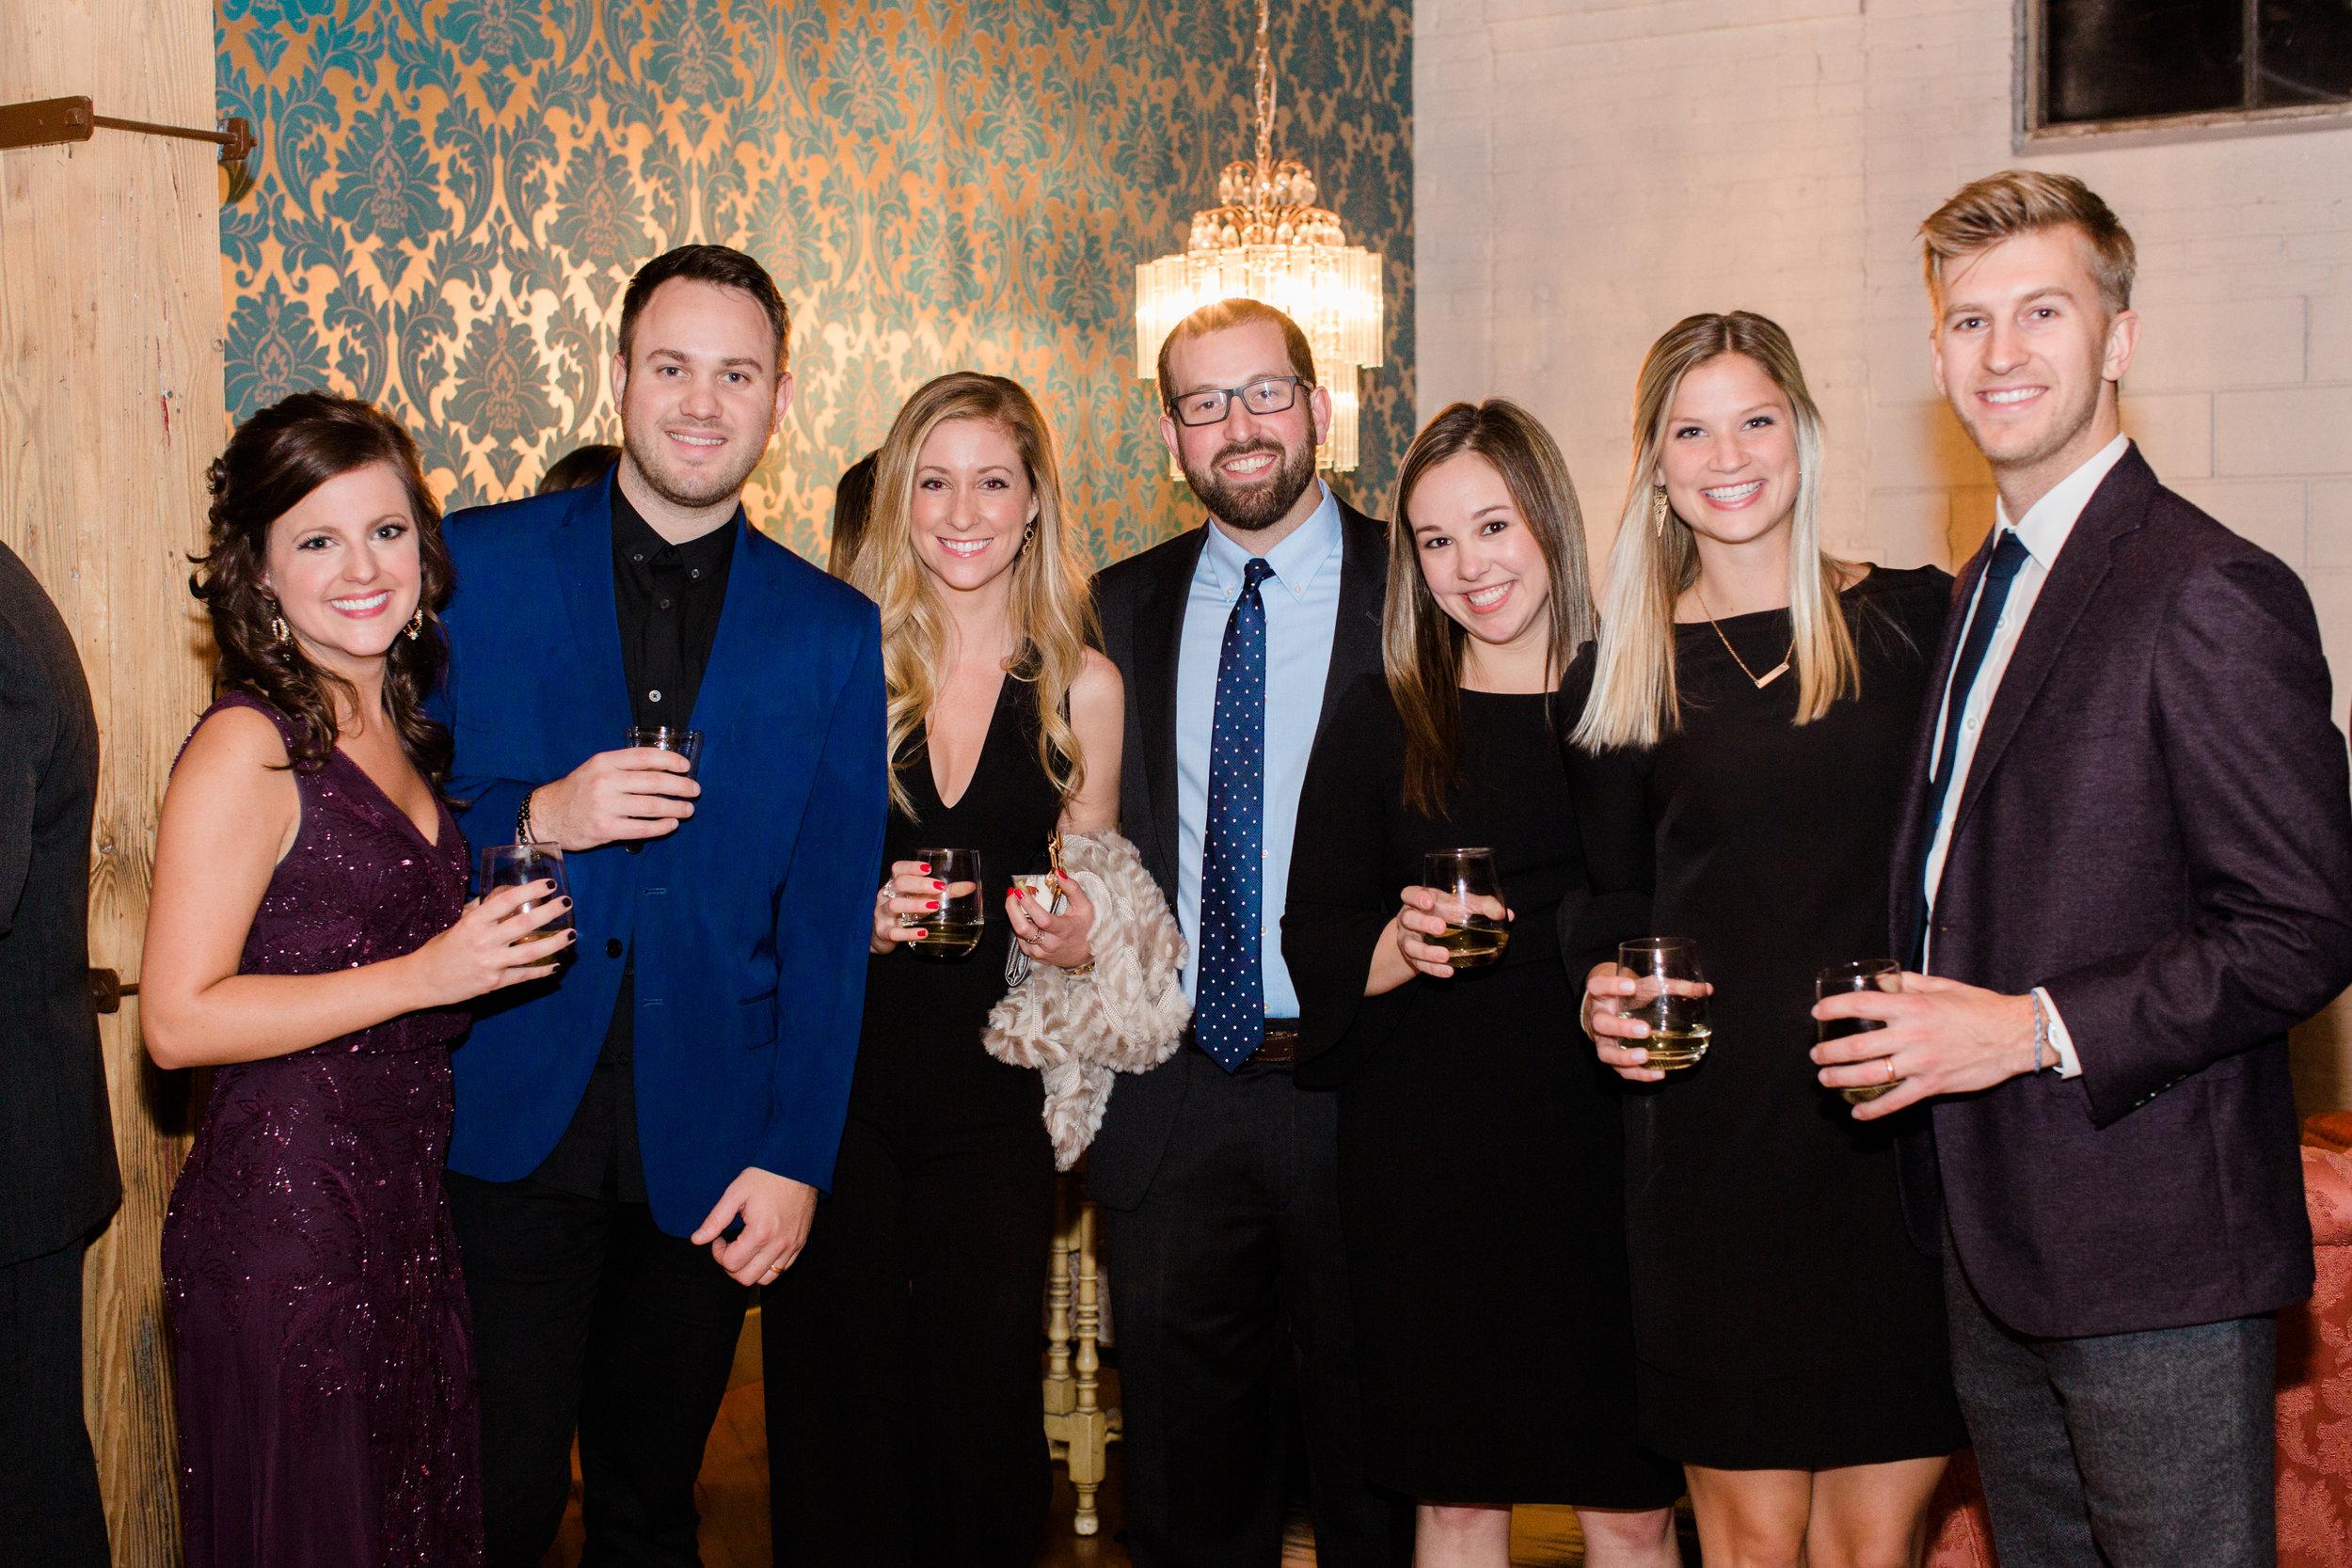 Vogelzang+Wedding+Cocktail+Hour-27.jpg